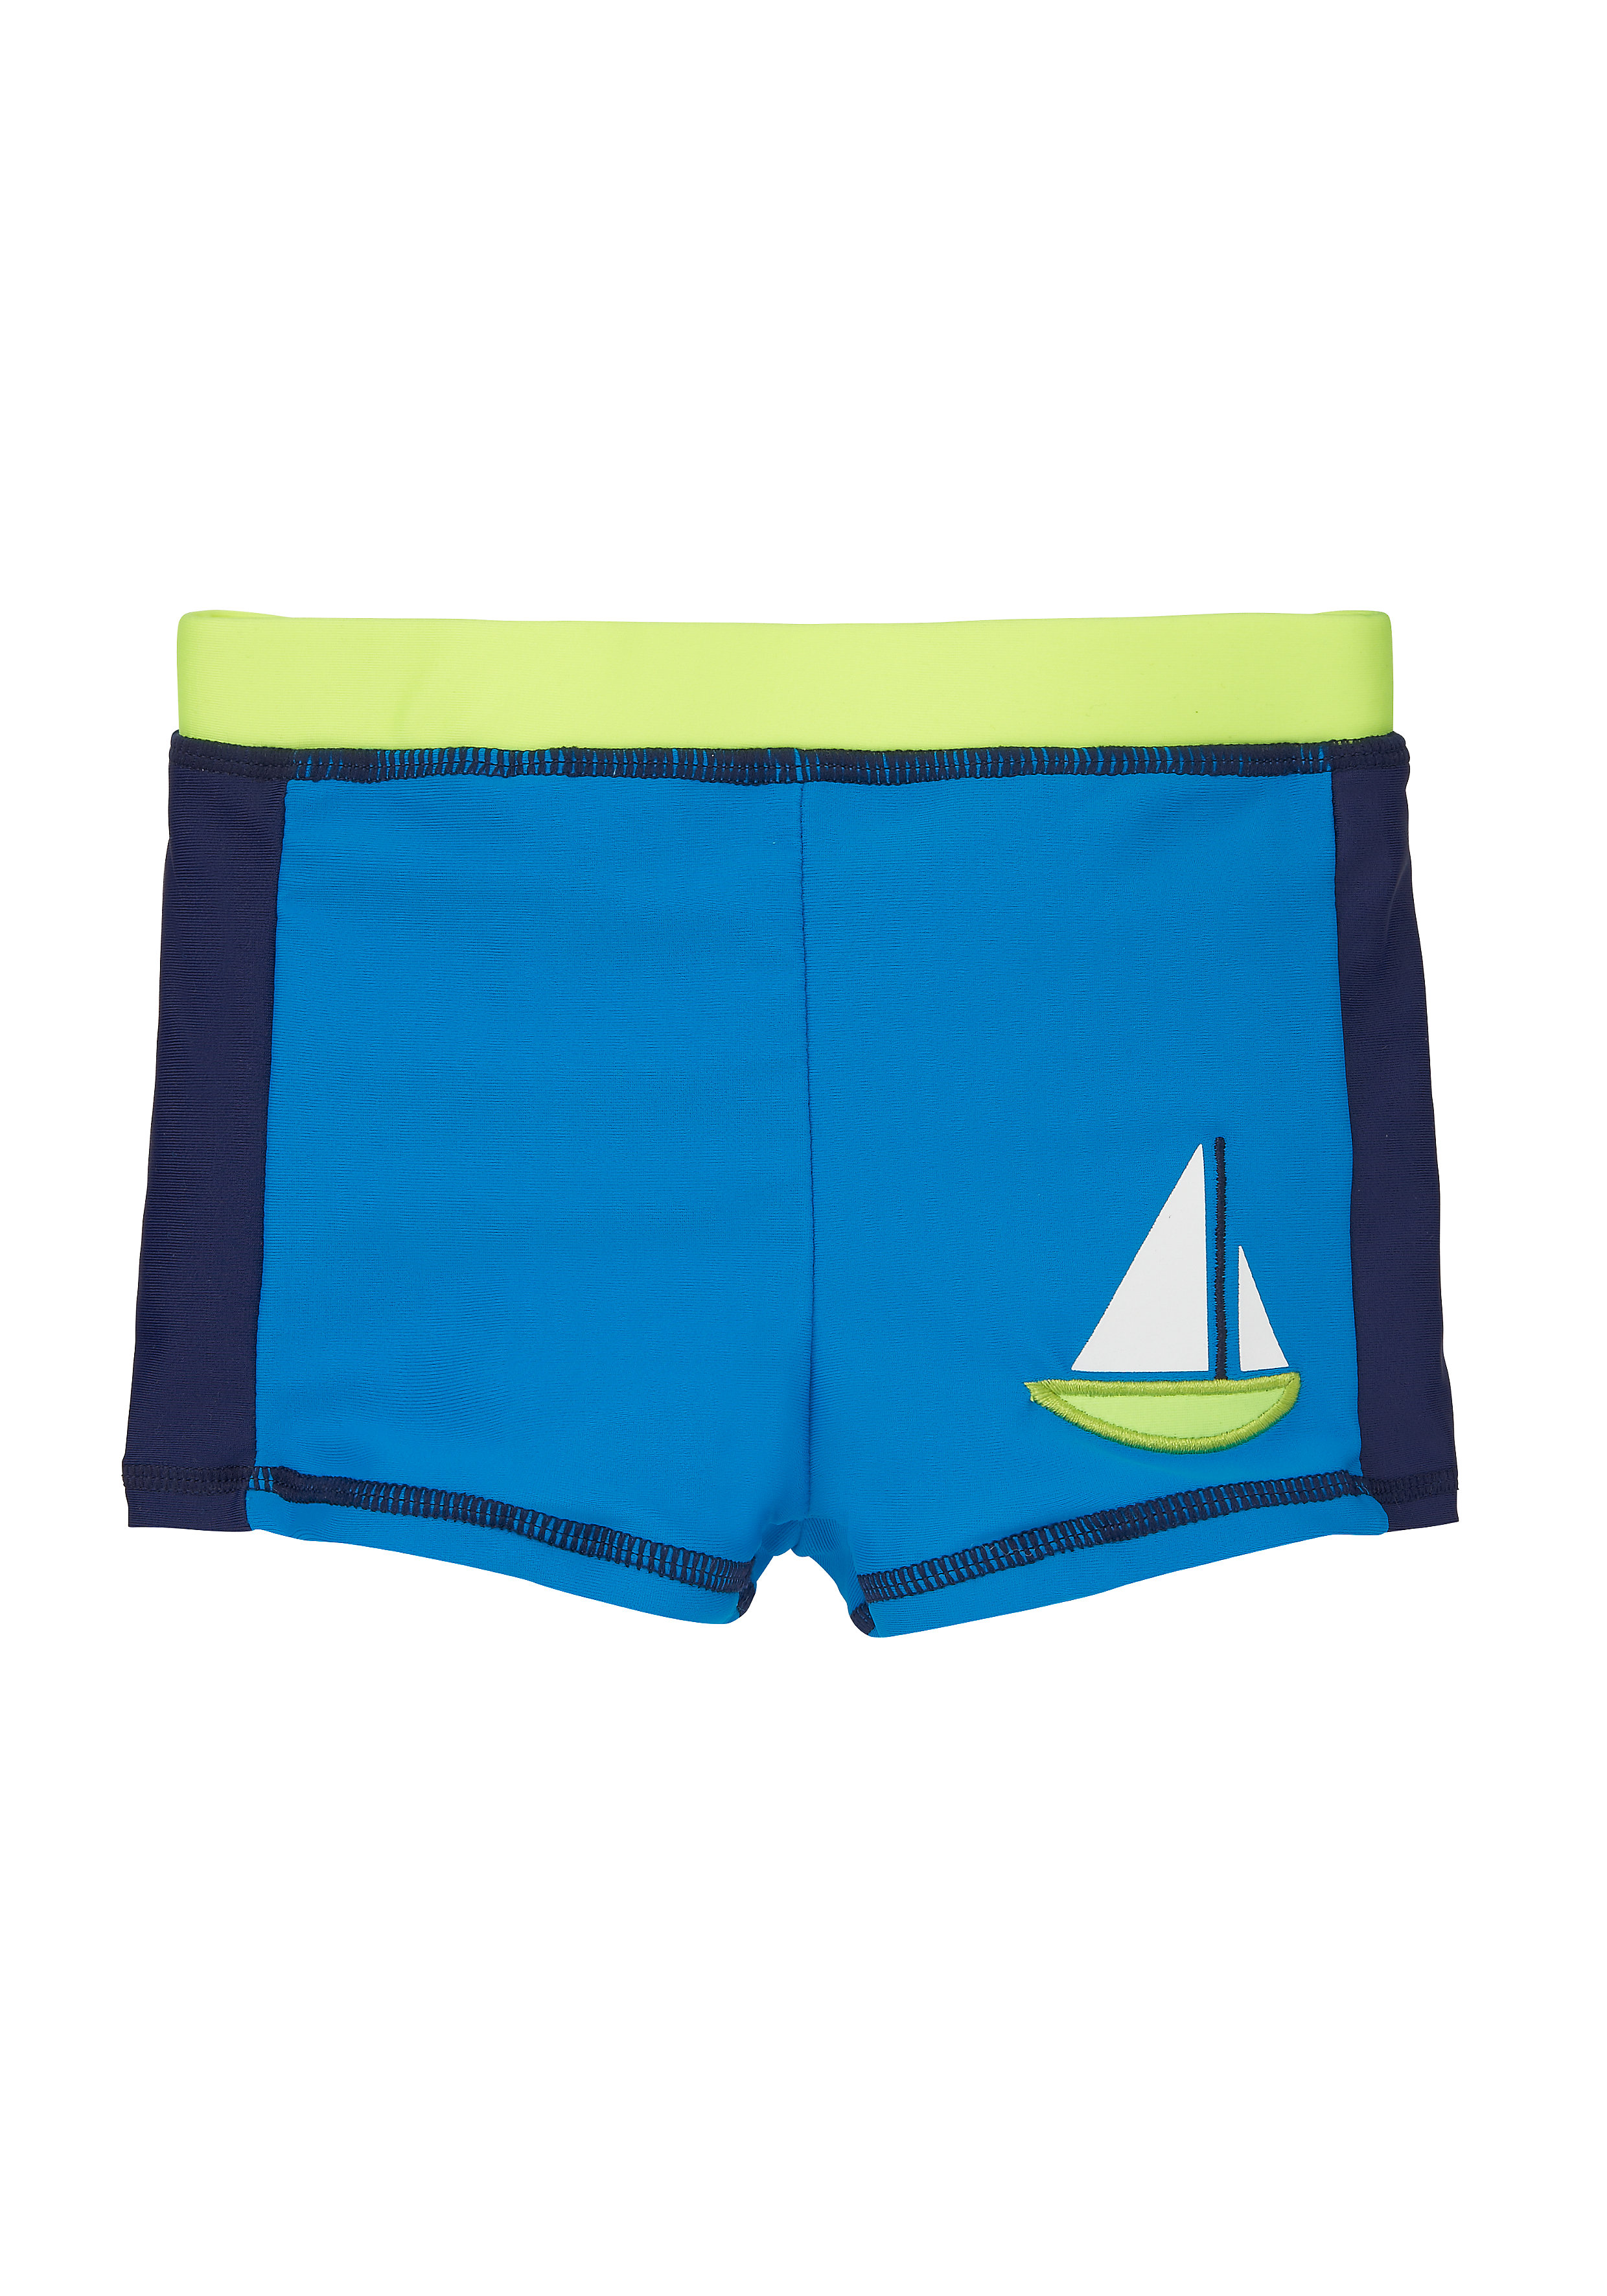 Mothercare | Boys Swimming Trunks Boat Design - Blue